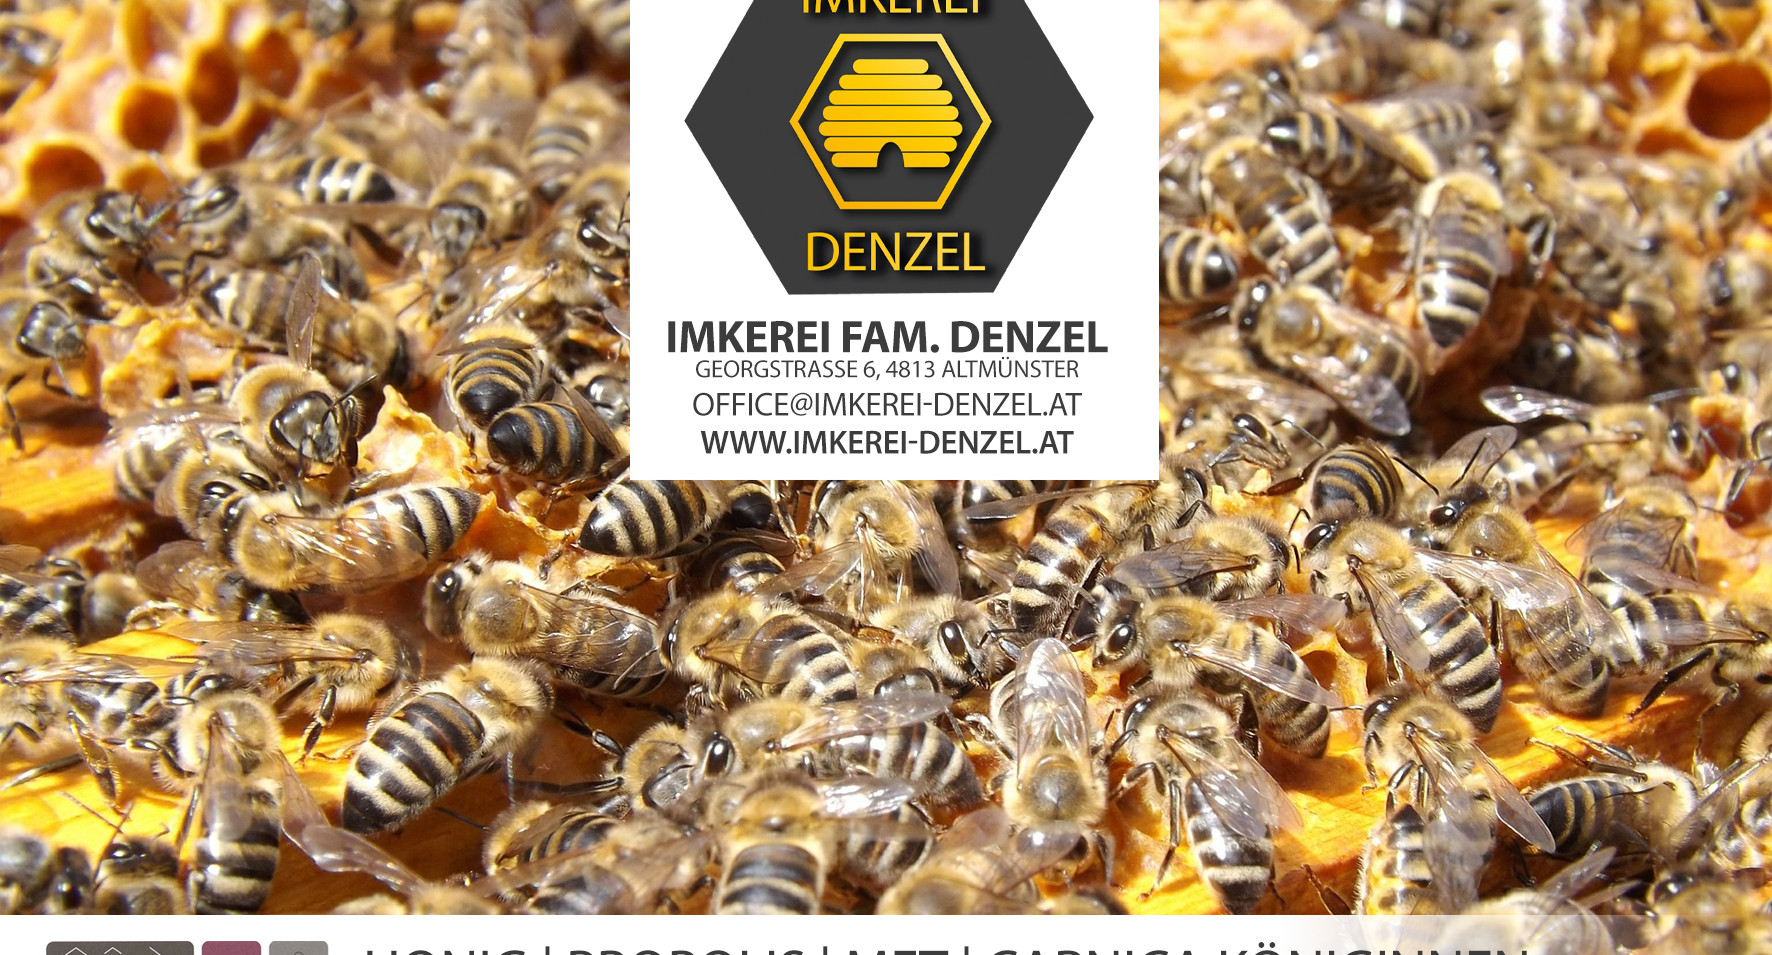 Imkerei Familie Denzel